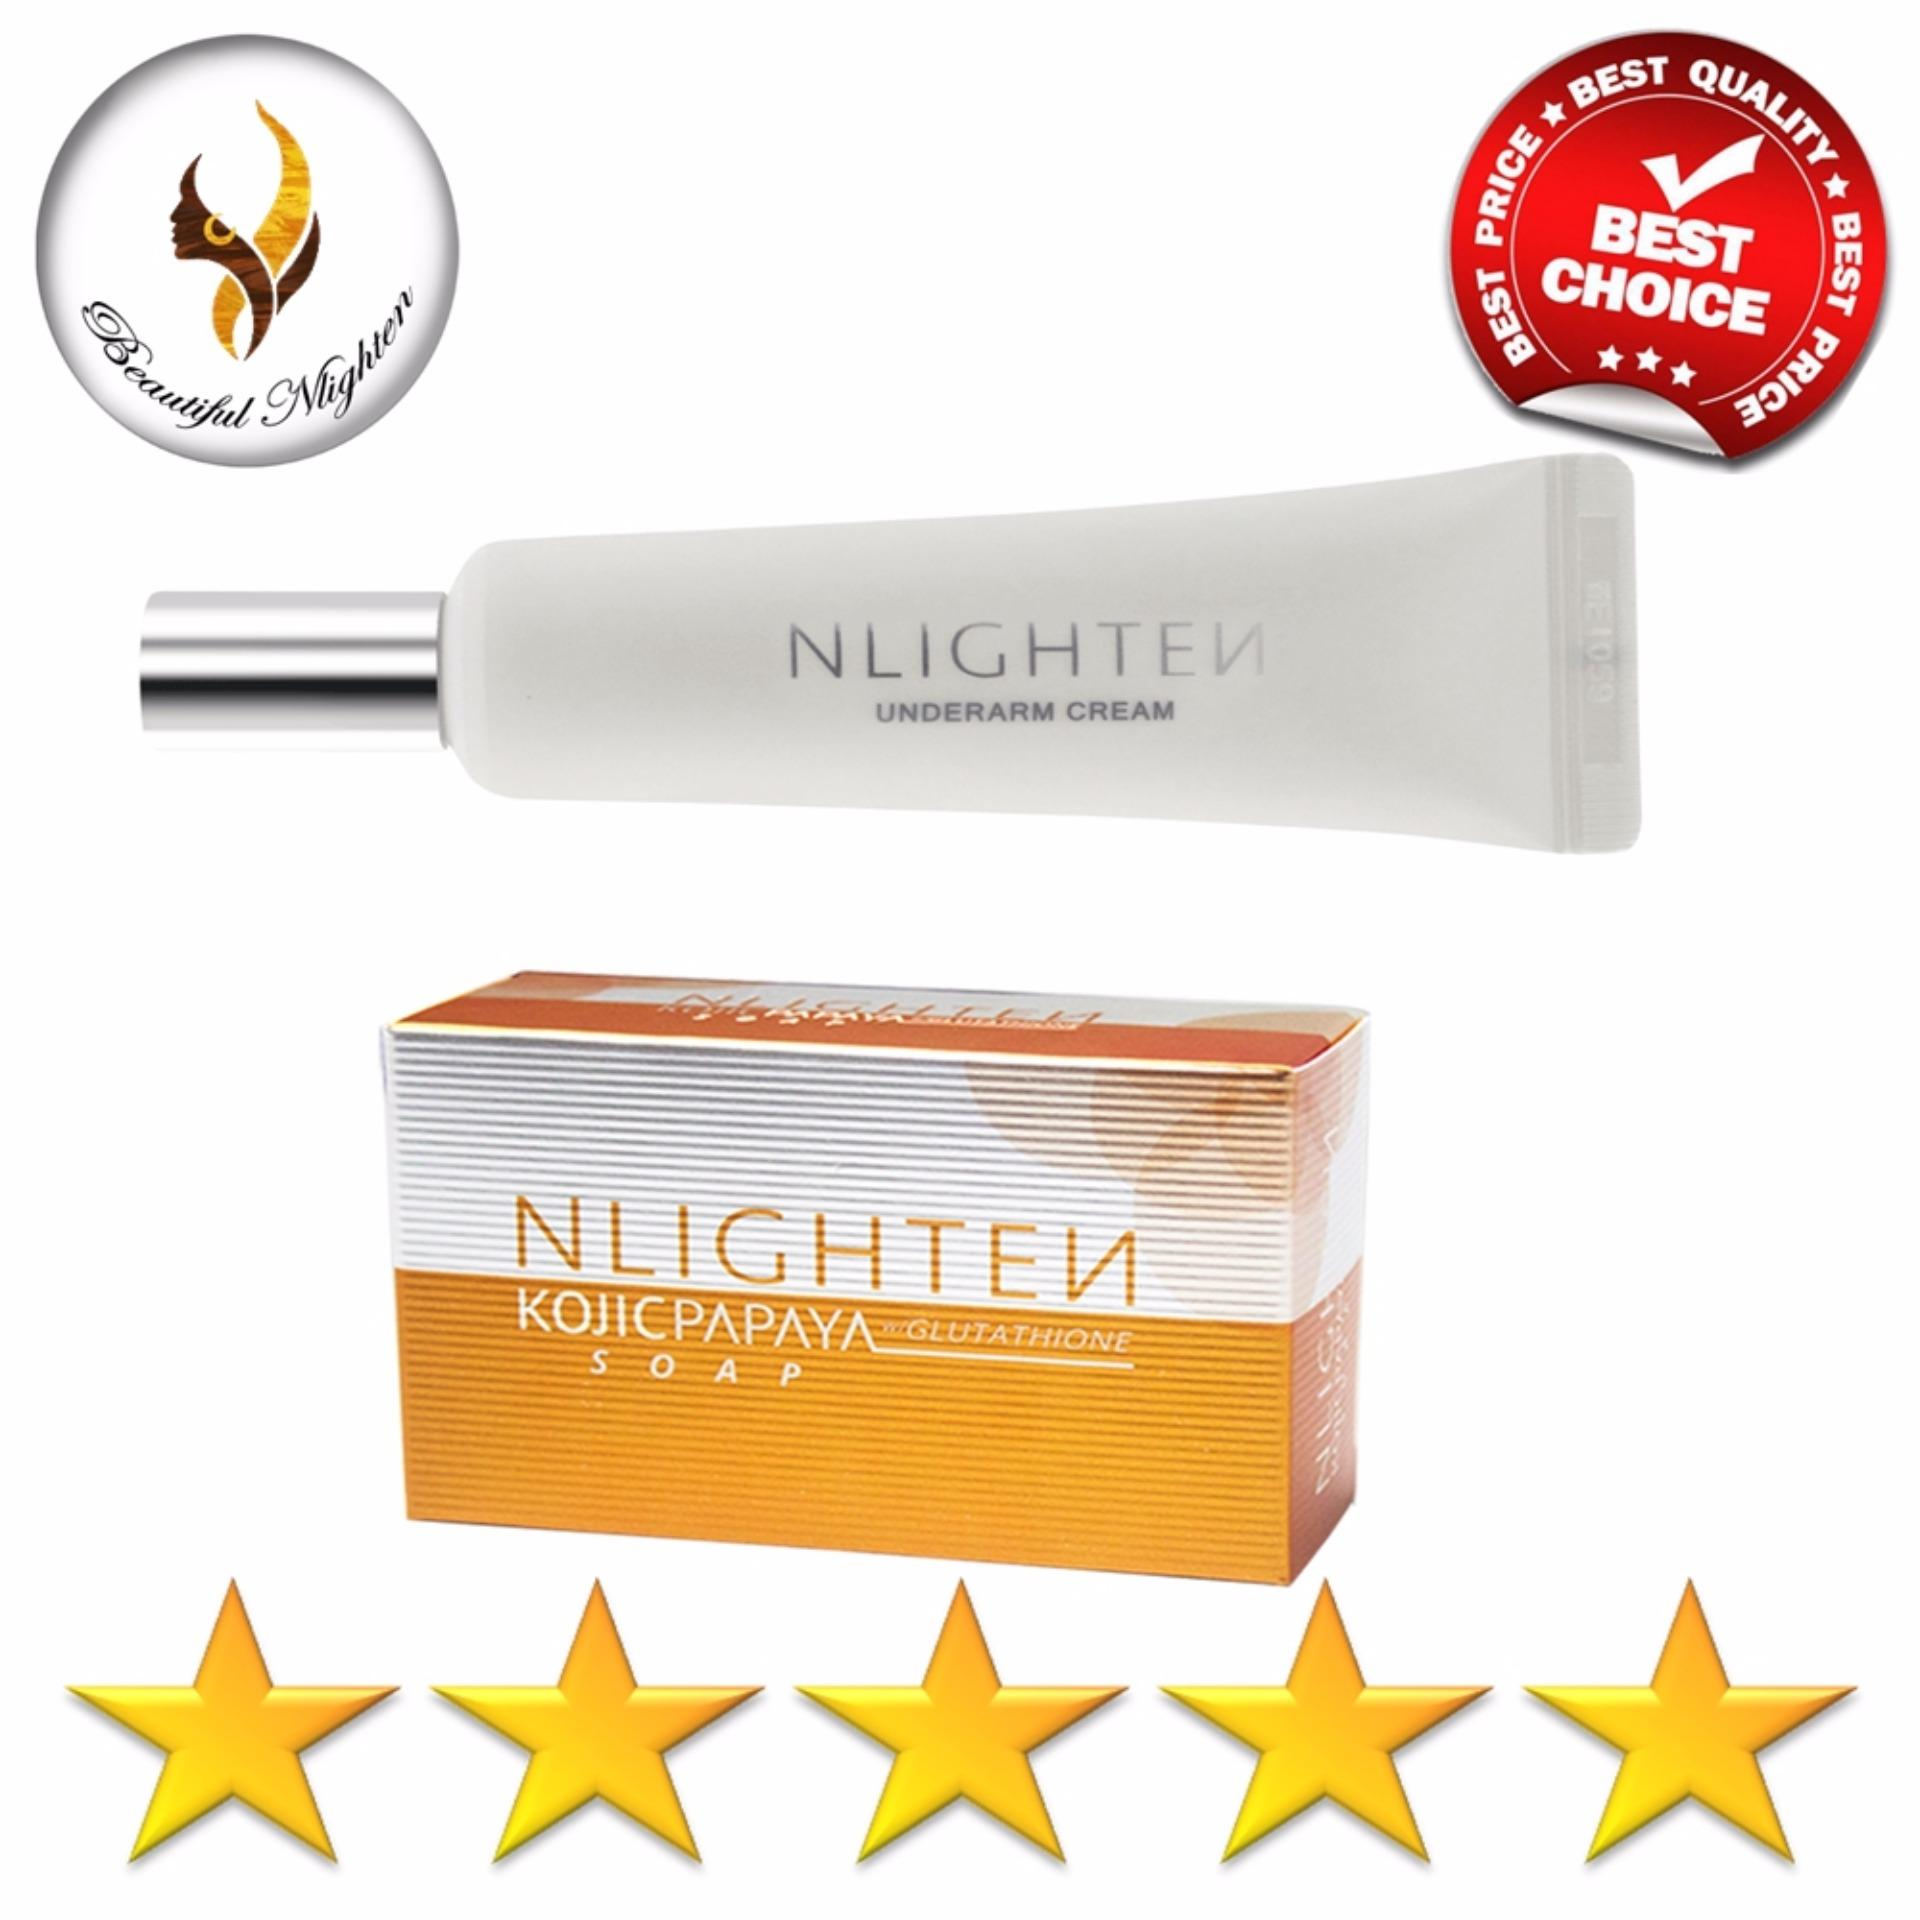 NLighten Underarm Instant Brightening Set of Kojic Papaya Soap and Underarm Cream